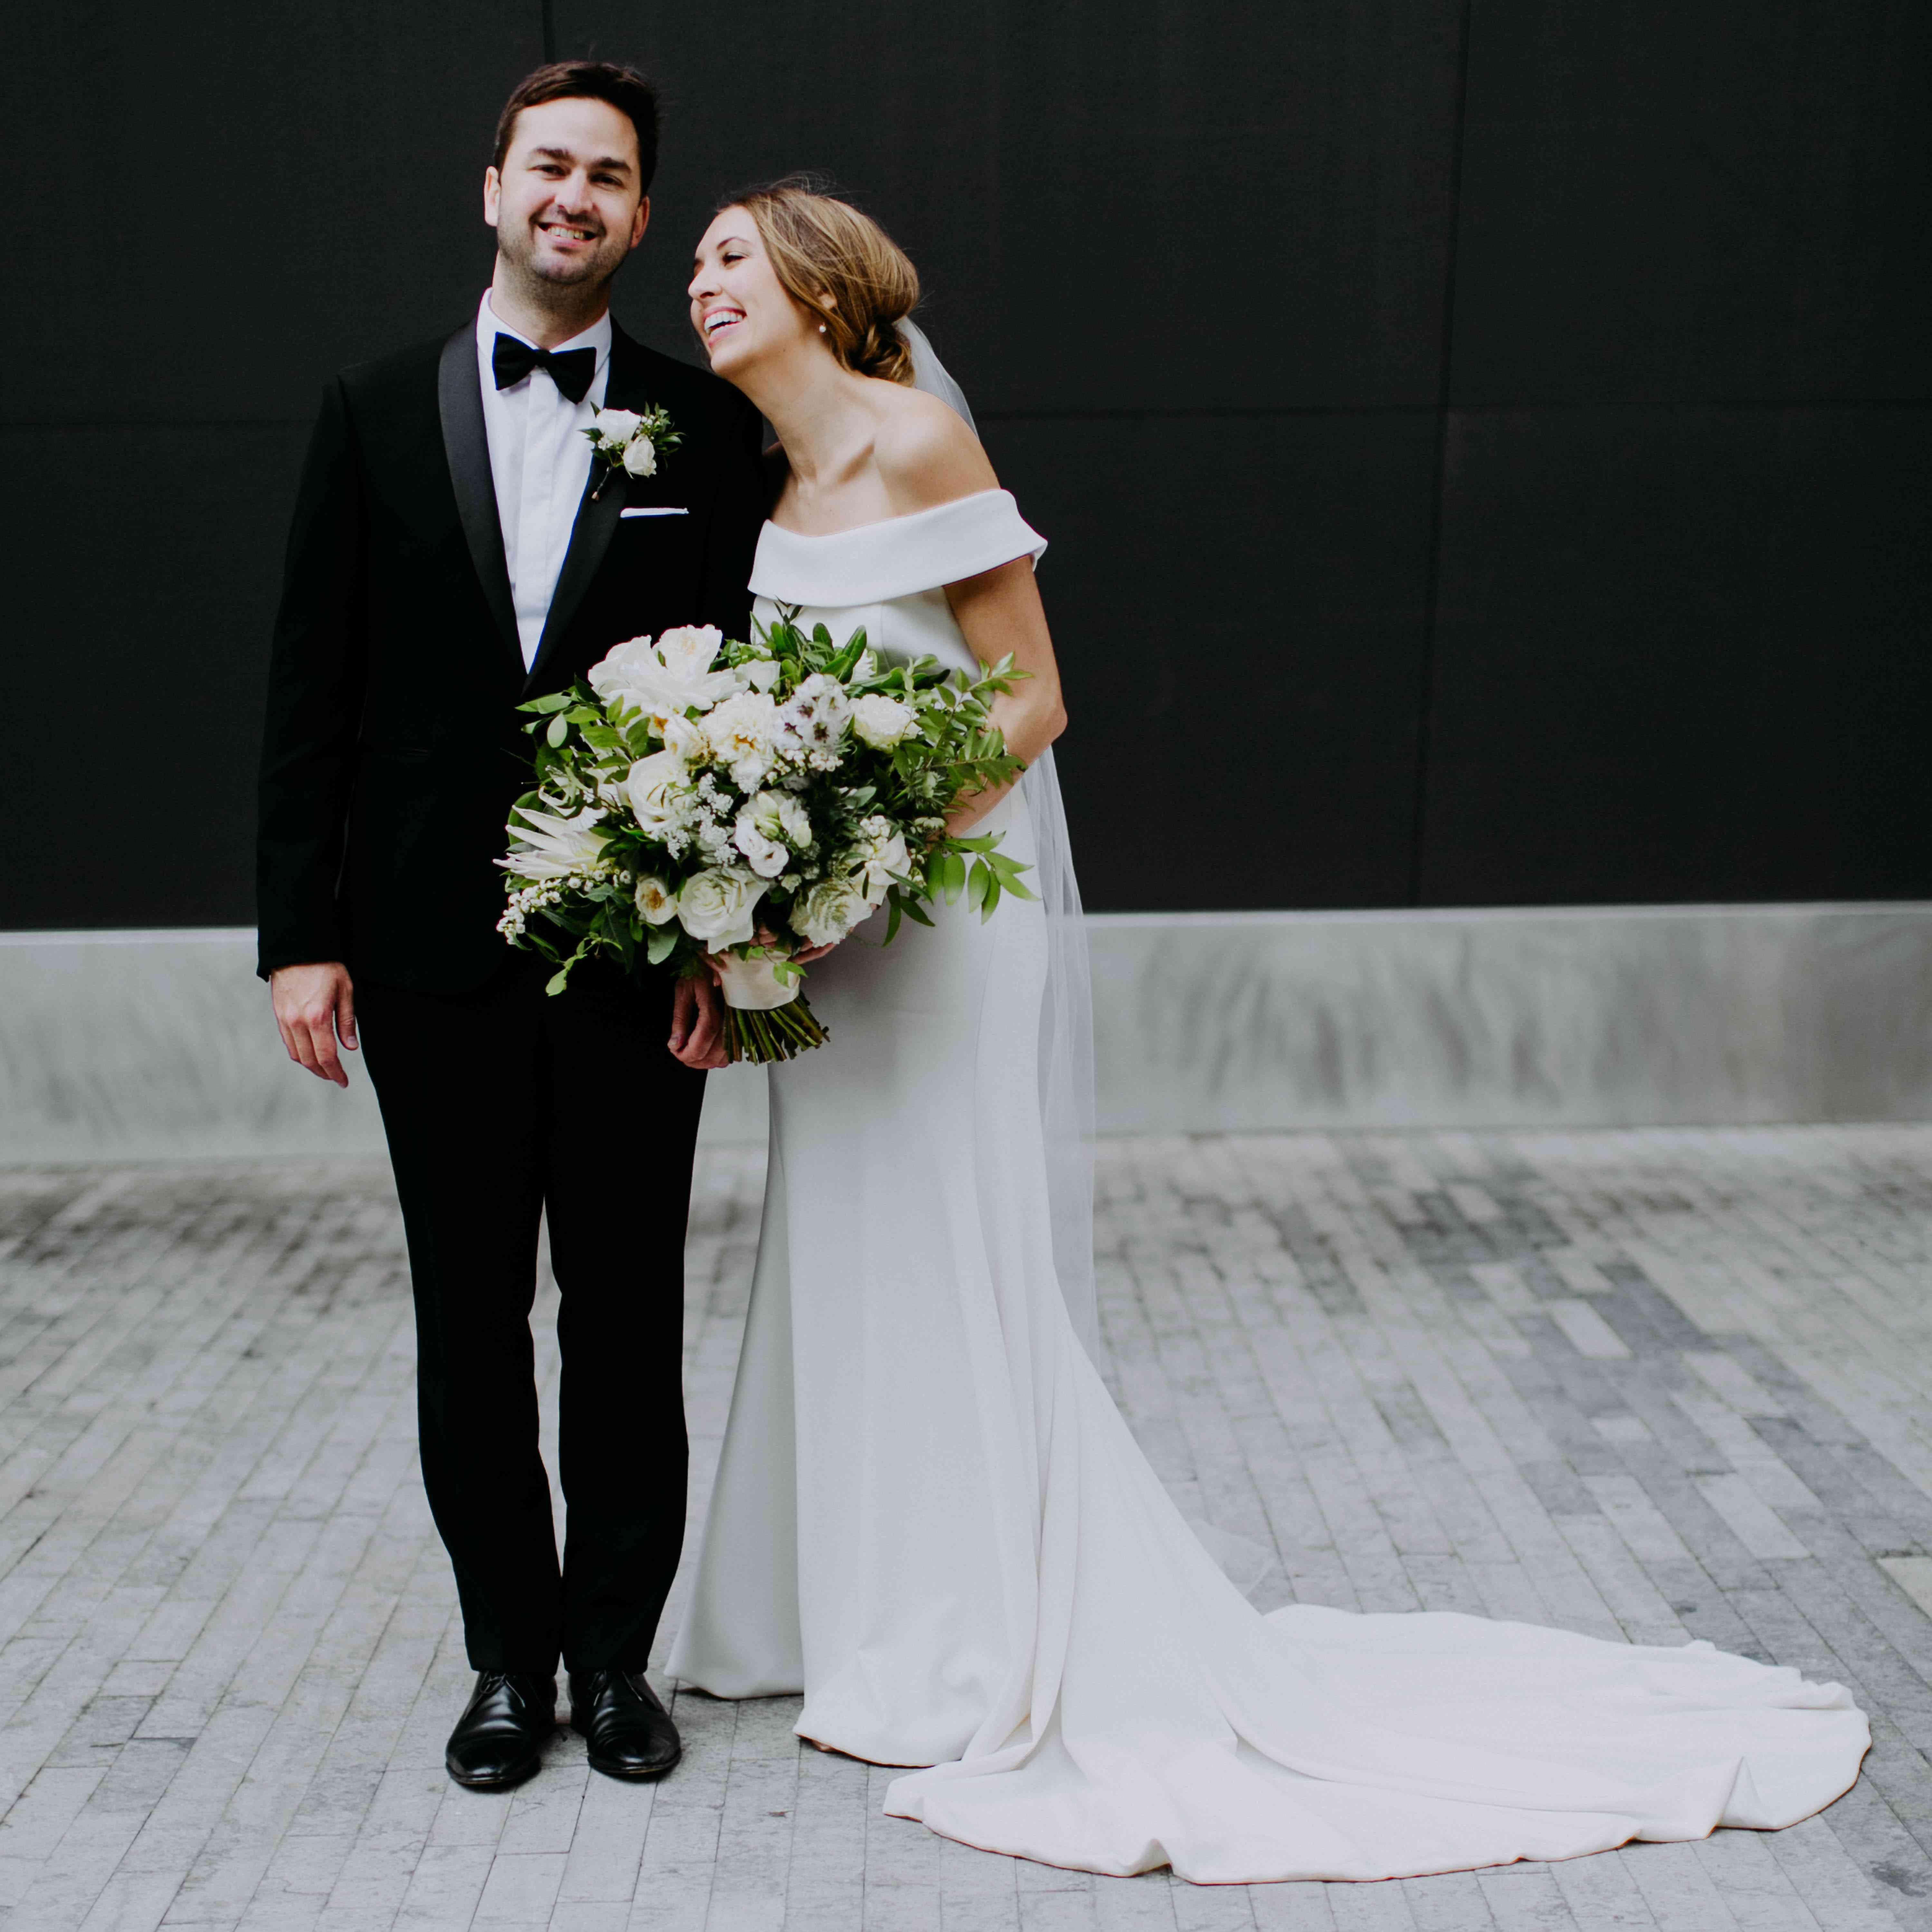 Story Comedian Iliza Shlesinger Wedding: A Modern Wedding Celebration In The Heart Of Brooklyn